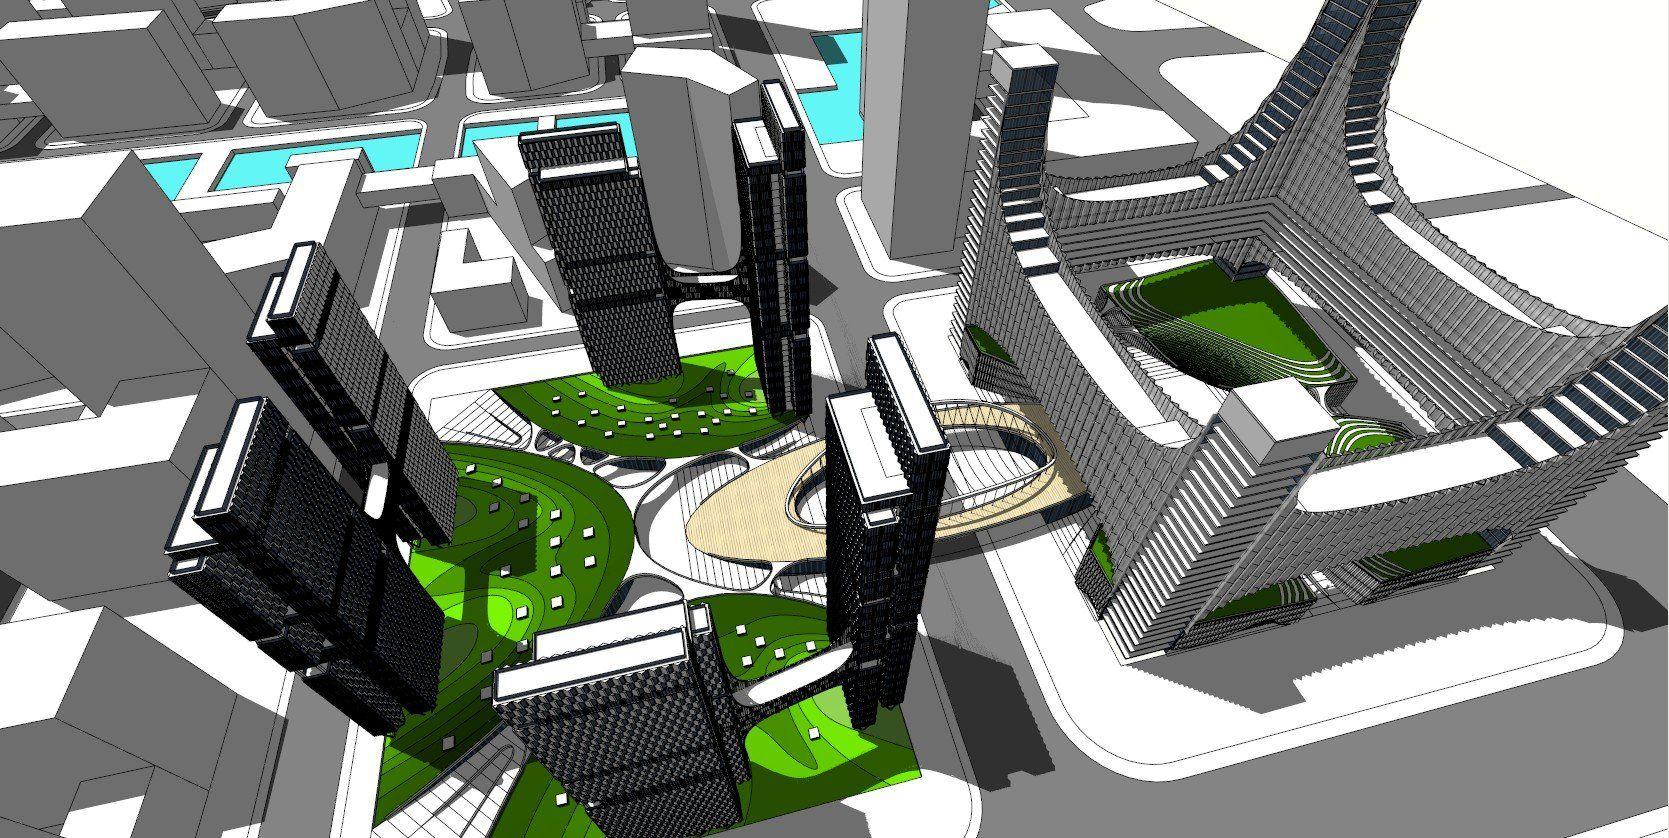 ☆Sketchup 3D Models-Skyscraper Sketchup Models | ☆Sketchup